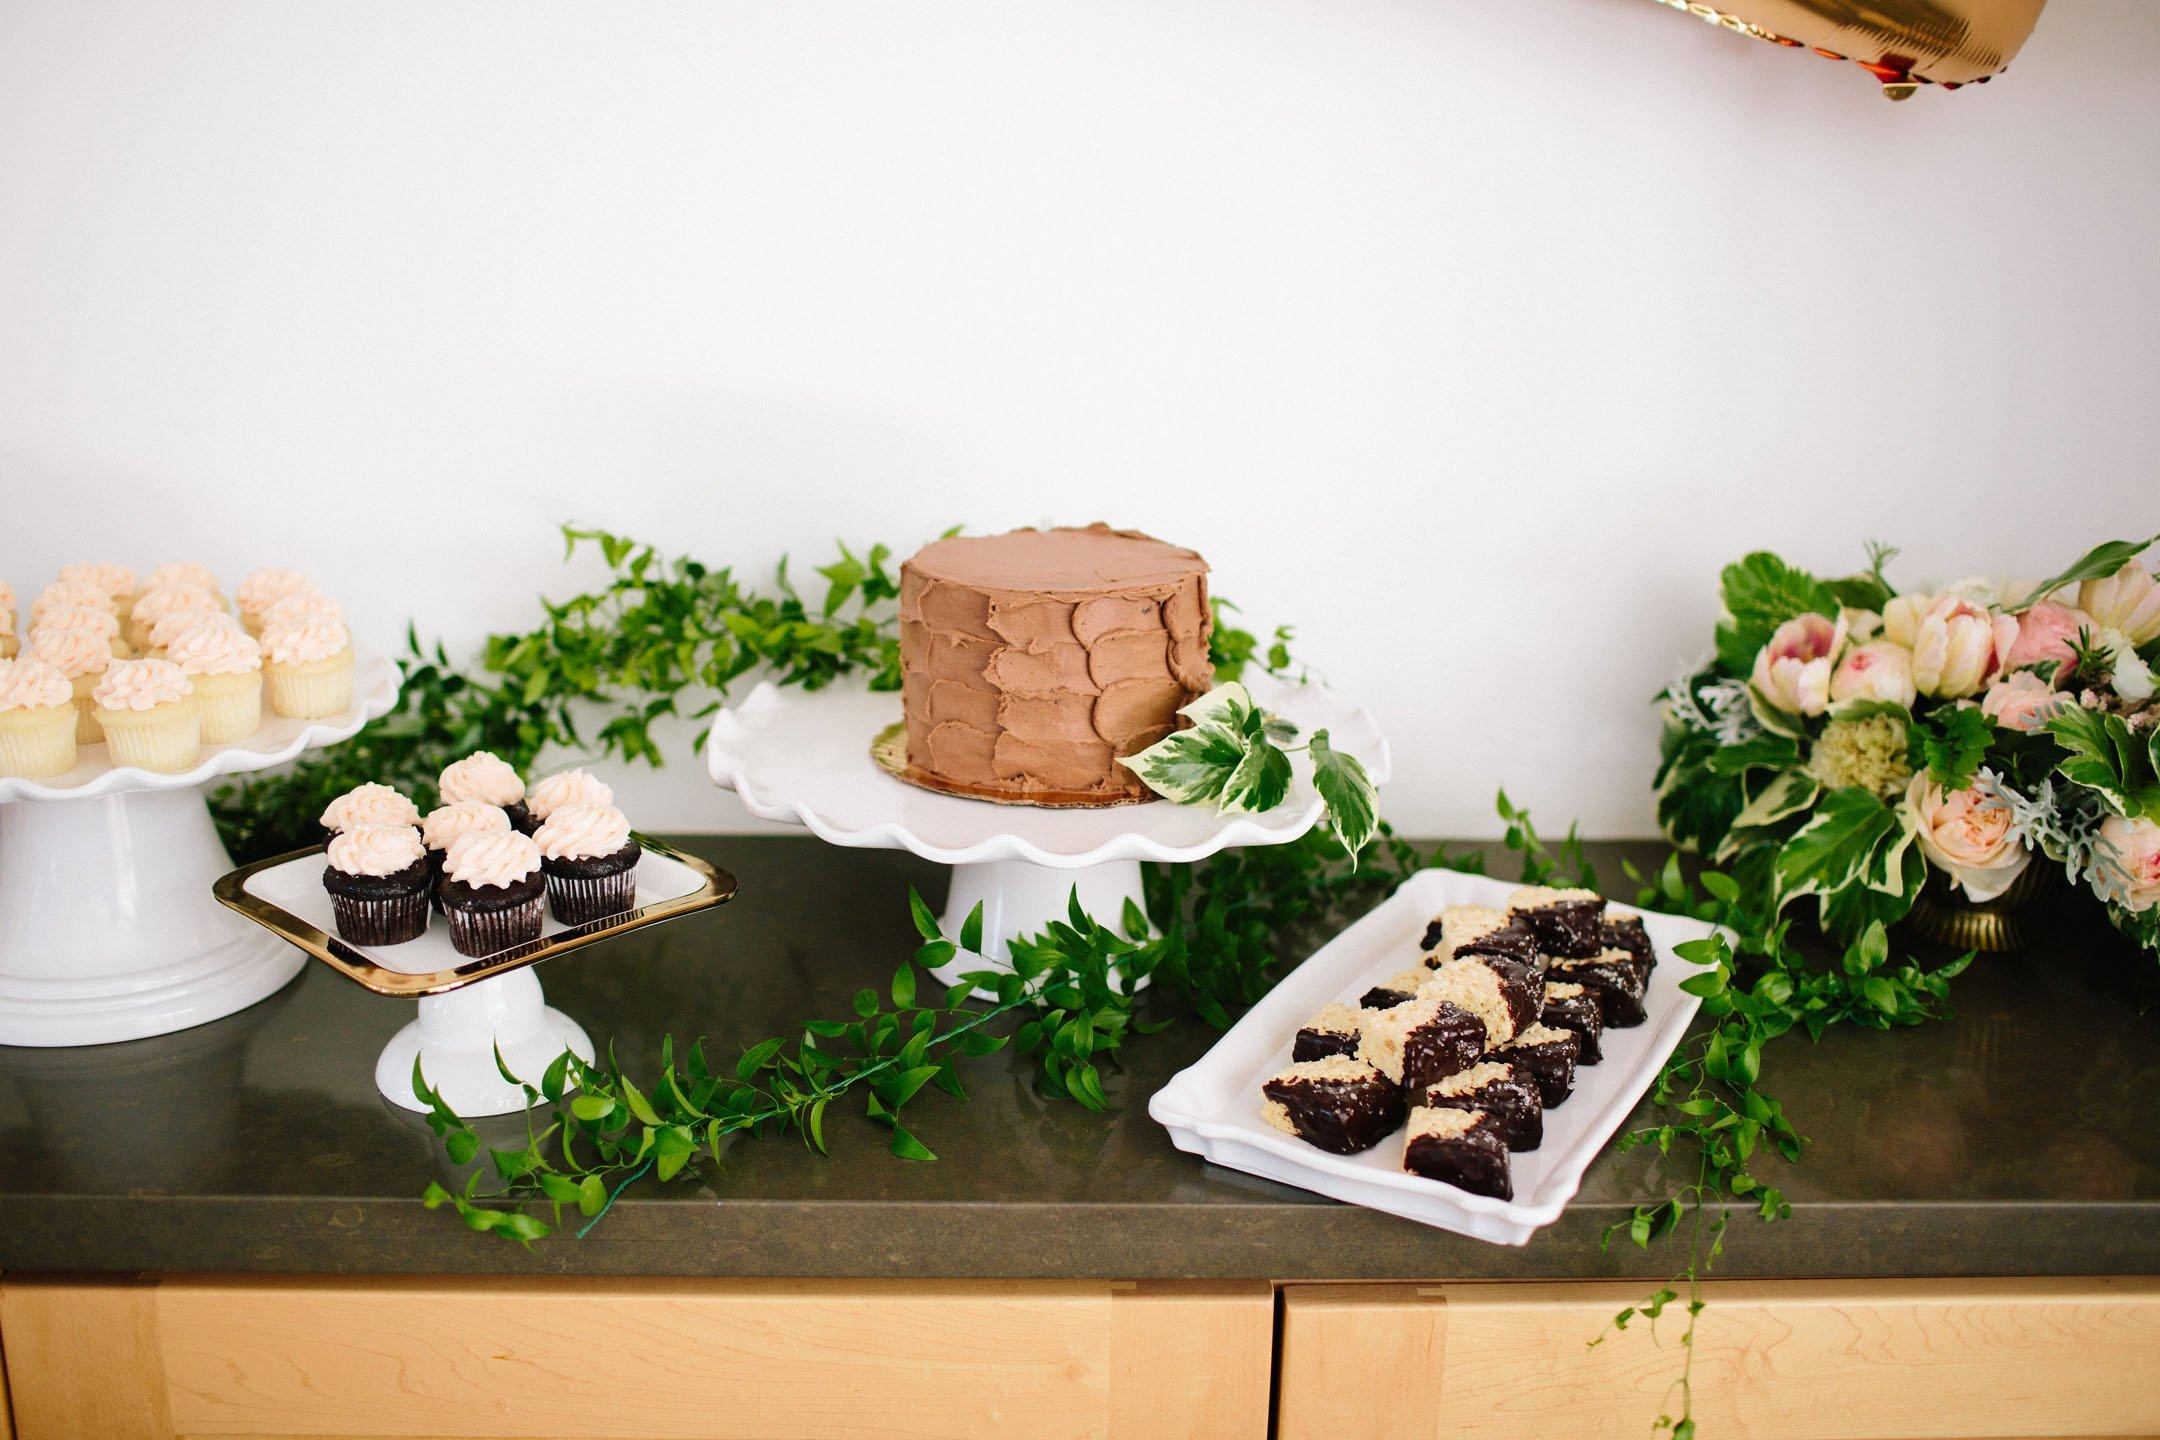 sift dessert bar vegan chocolate cake